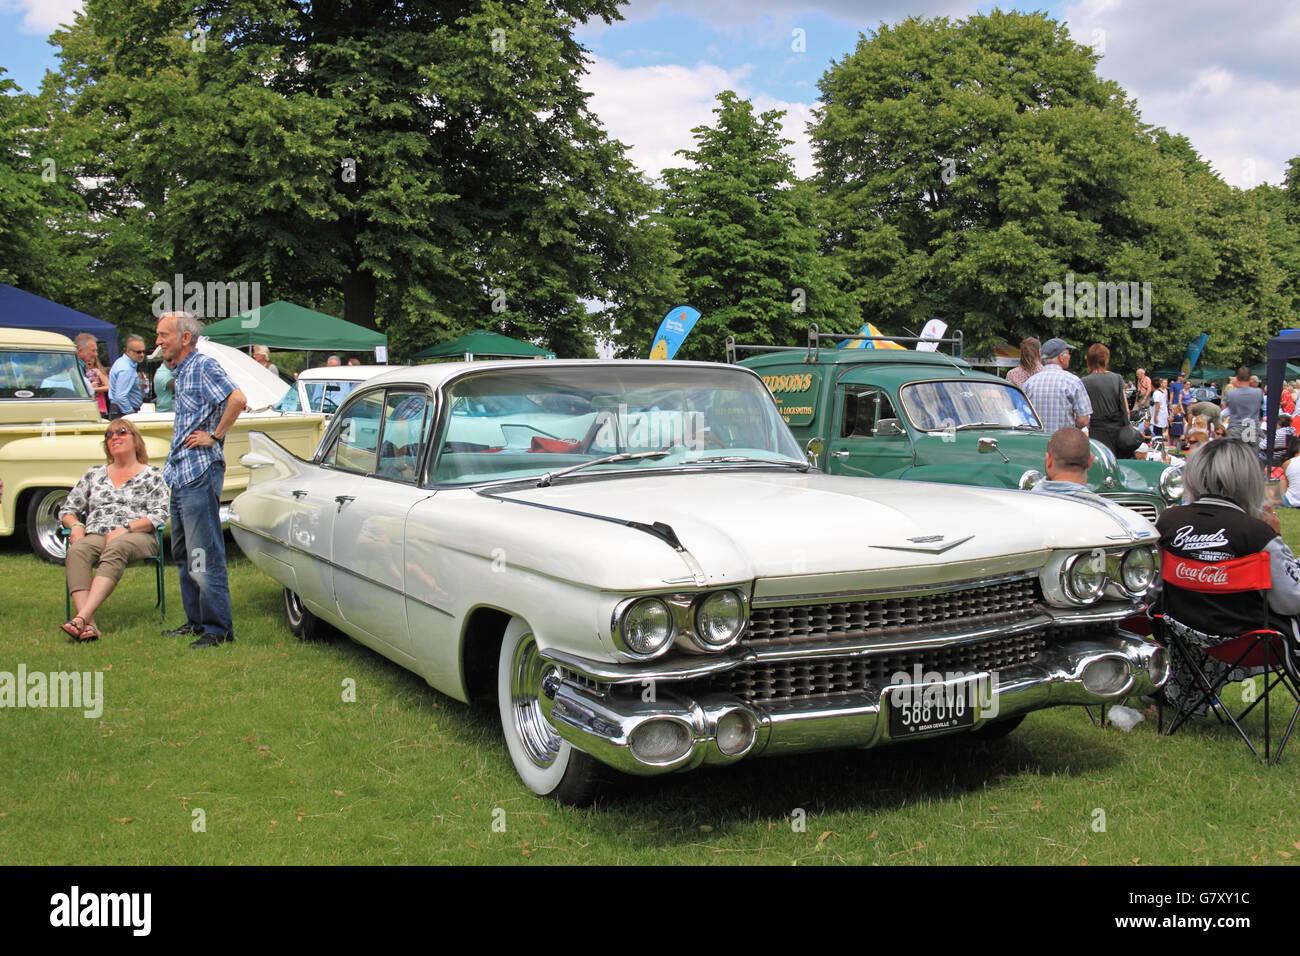 1959 cadillac sedan deville stockfotos & 1959 cadillac sedan deville